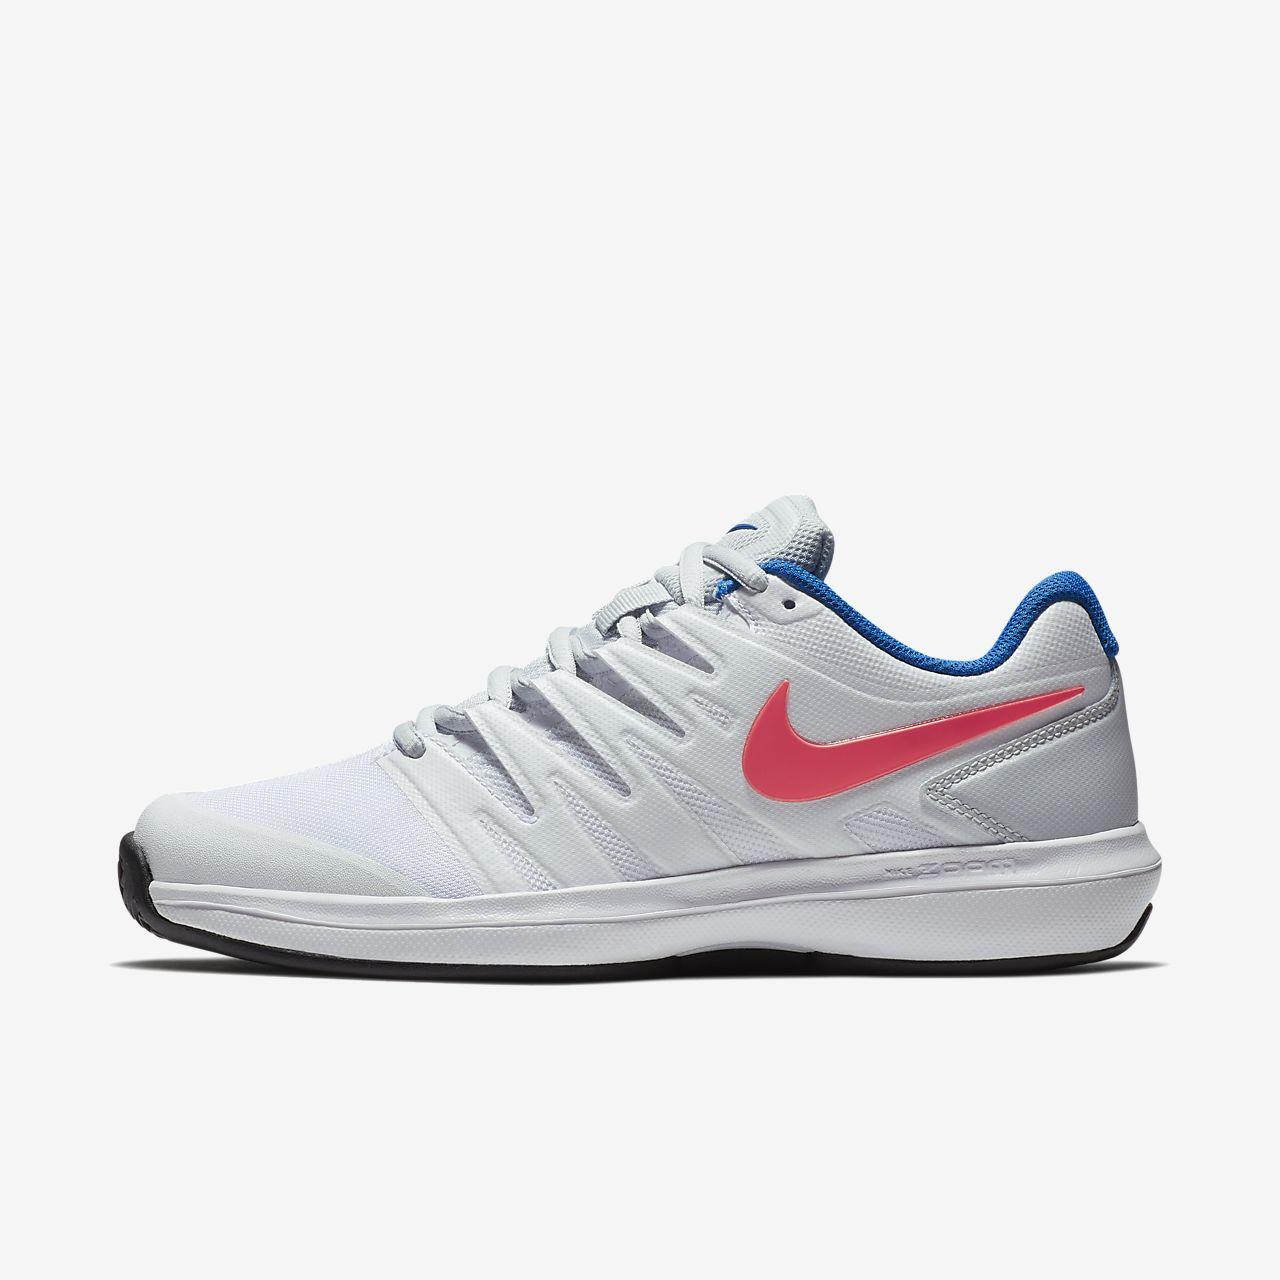 Nike Air Zoom Prestige Clay Damen-Tennisschuh - Weiß vSDKyzqiu